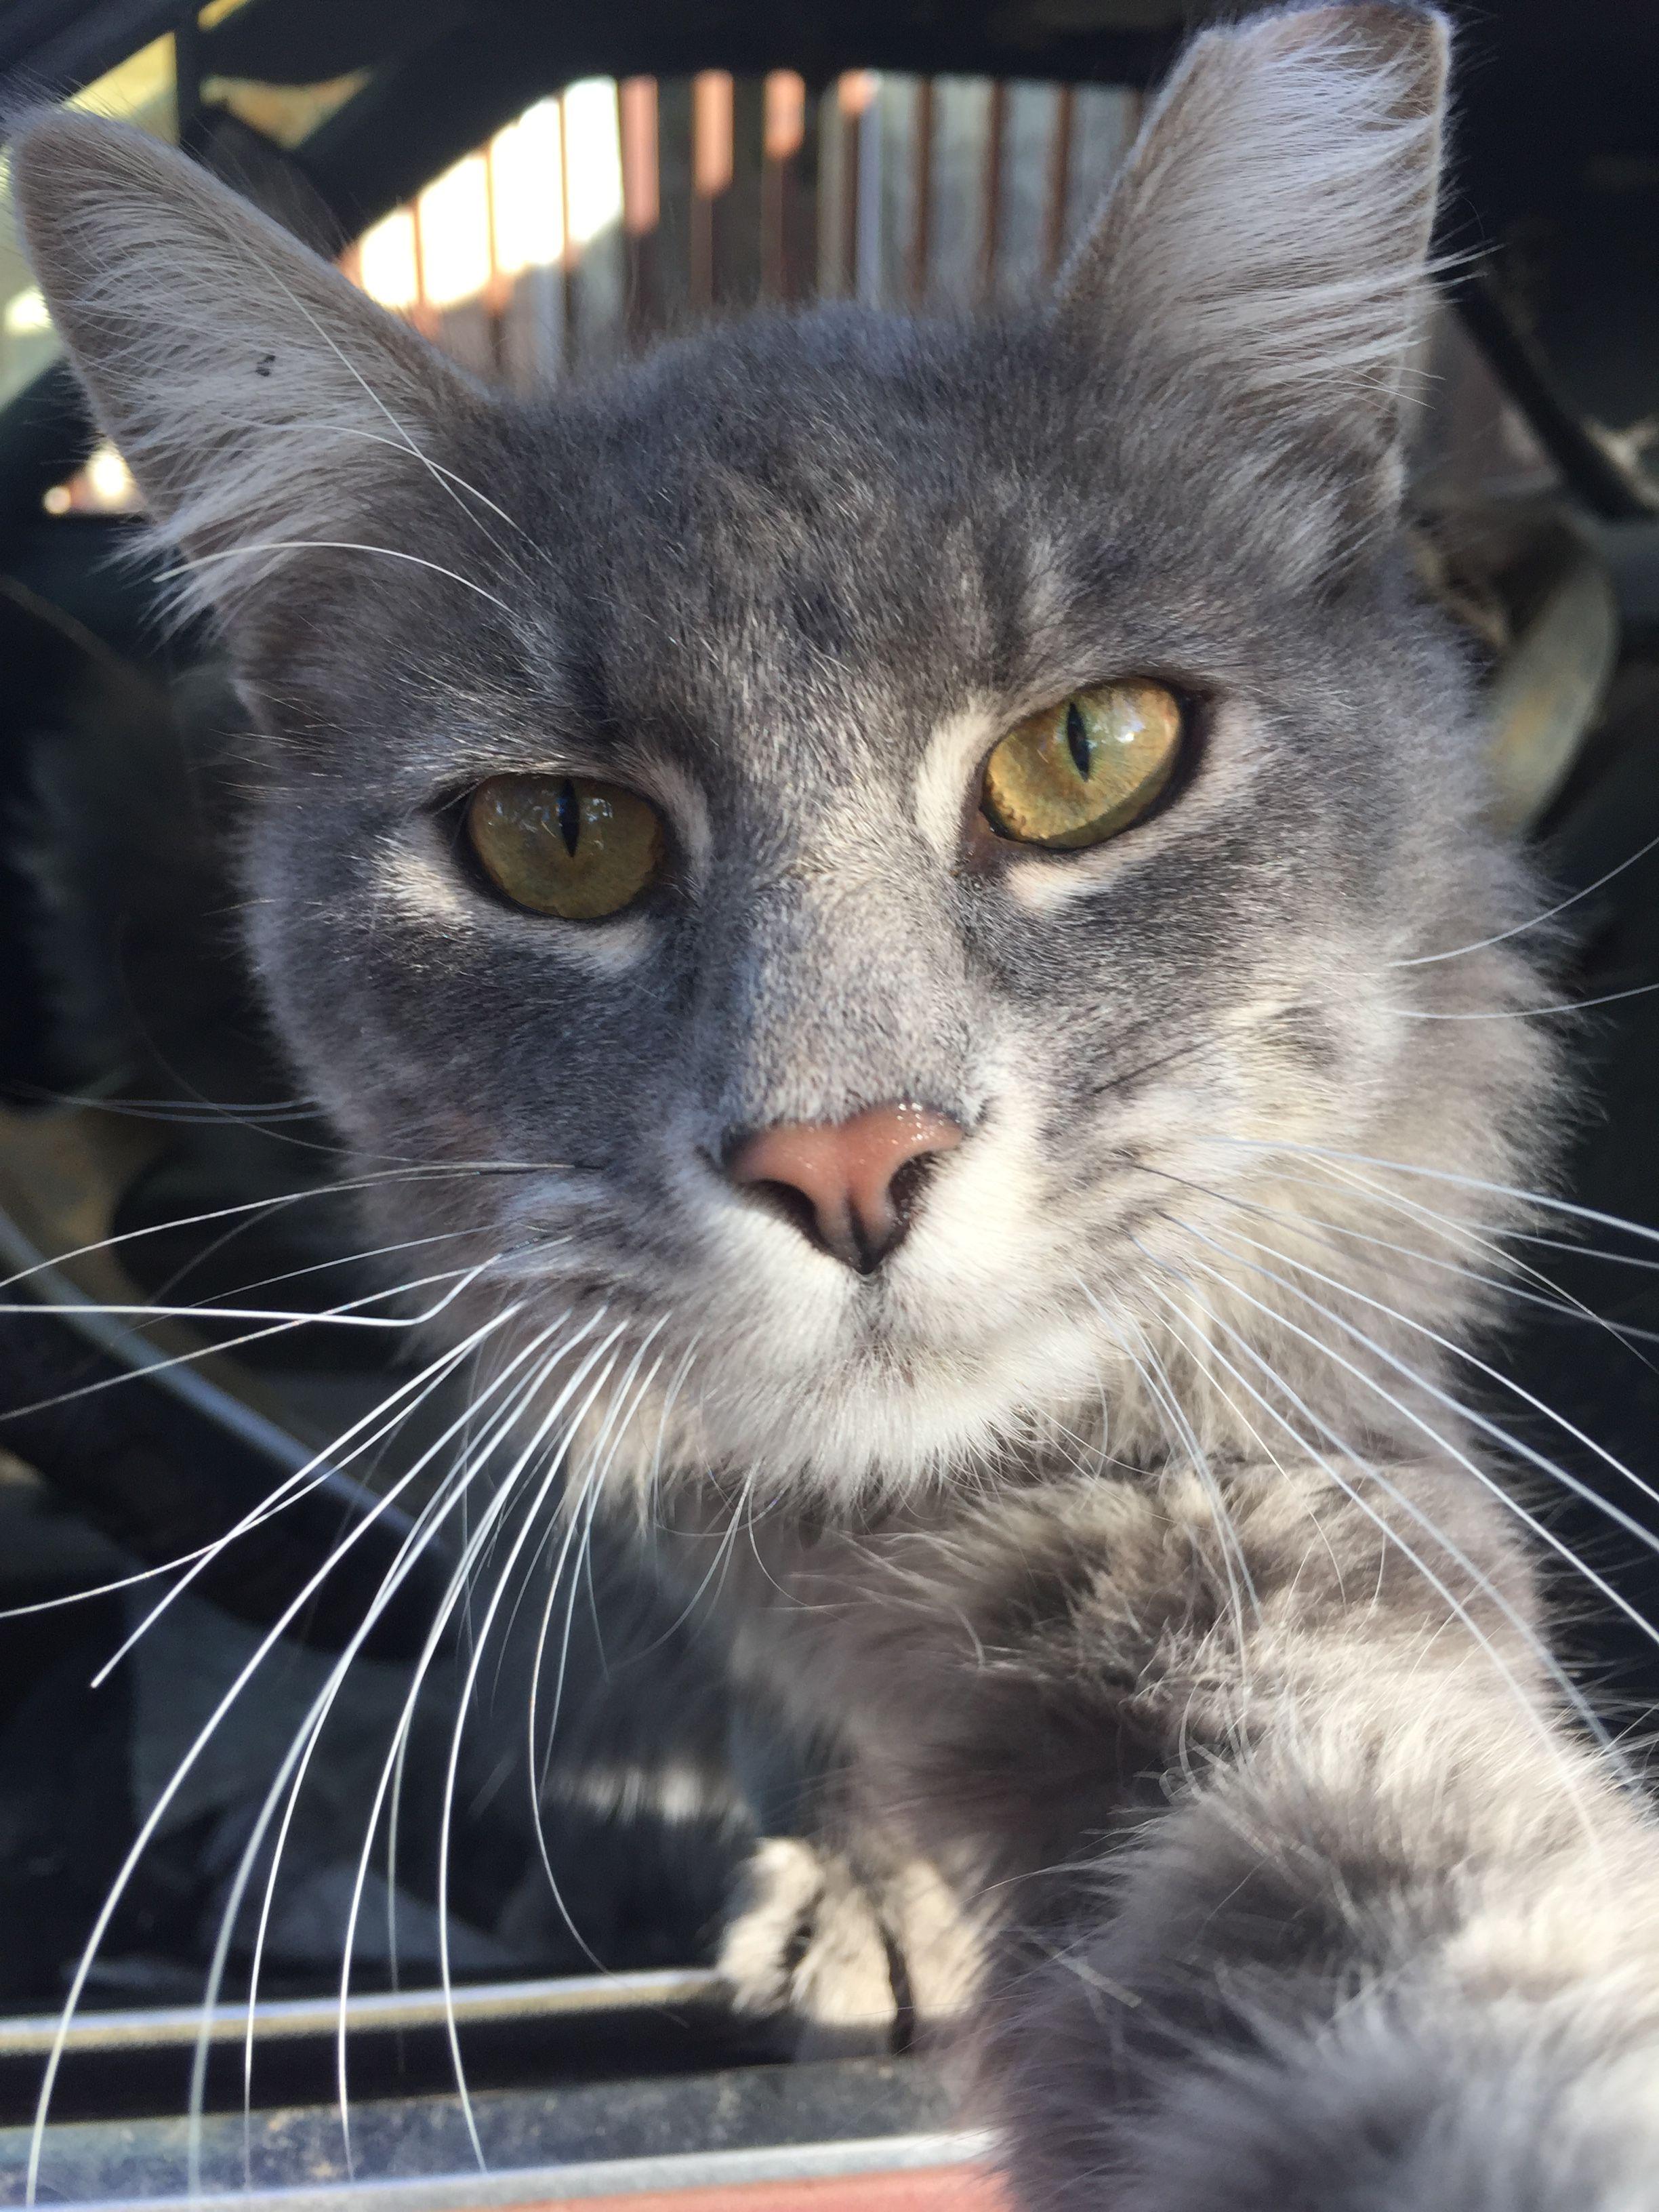 Selfie Kitty nudes (98 foto and video), Tits, Sideboobs, Twitter, legs 2018